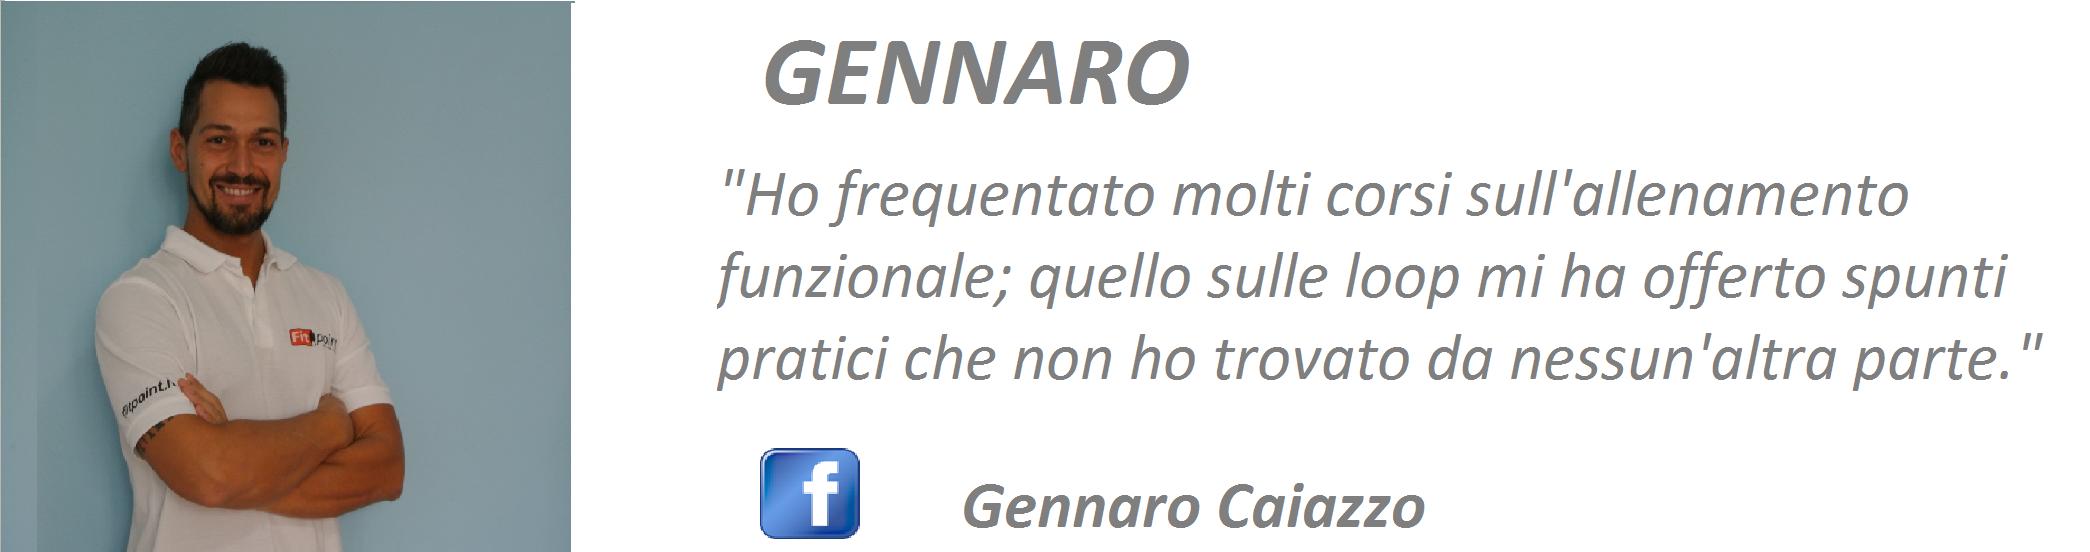 gennaro-2